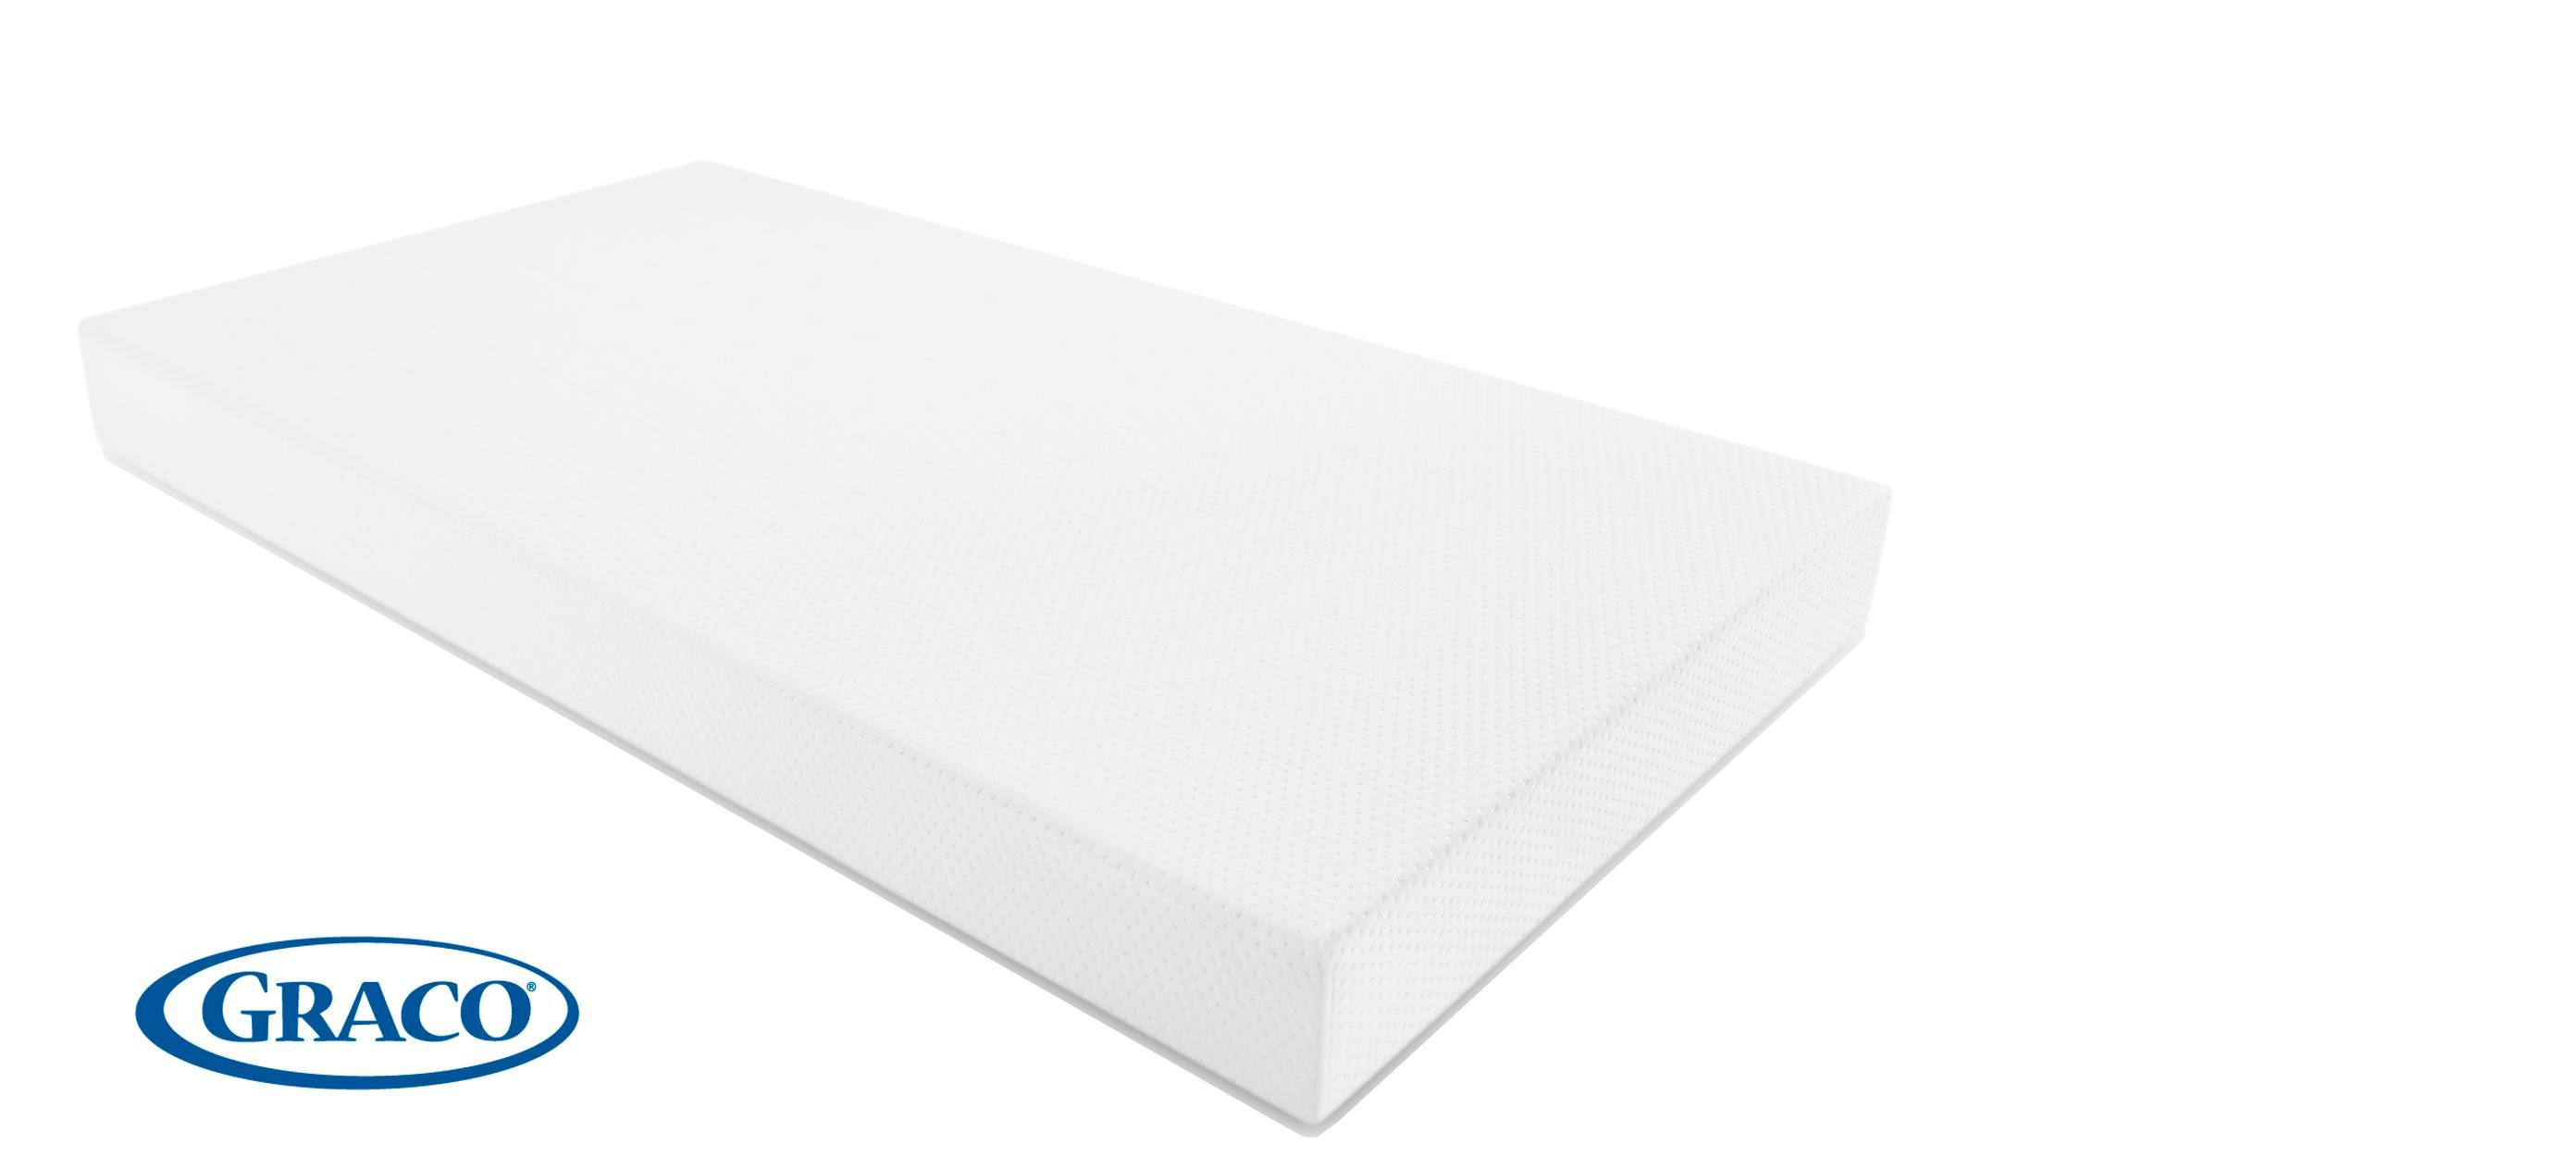 Amazon Graco Premium Foam Crib and Toddler Bed